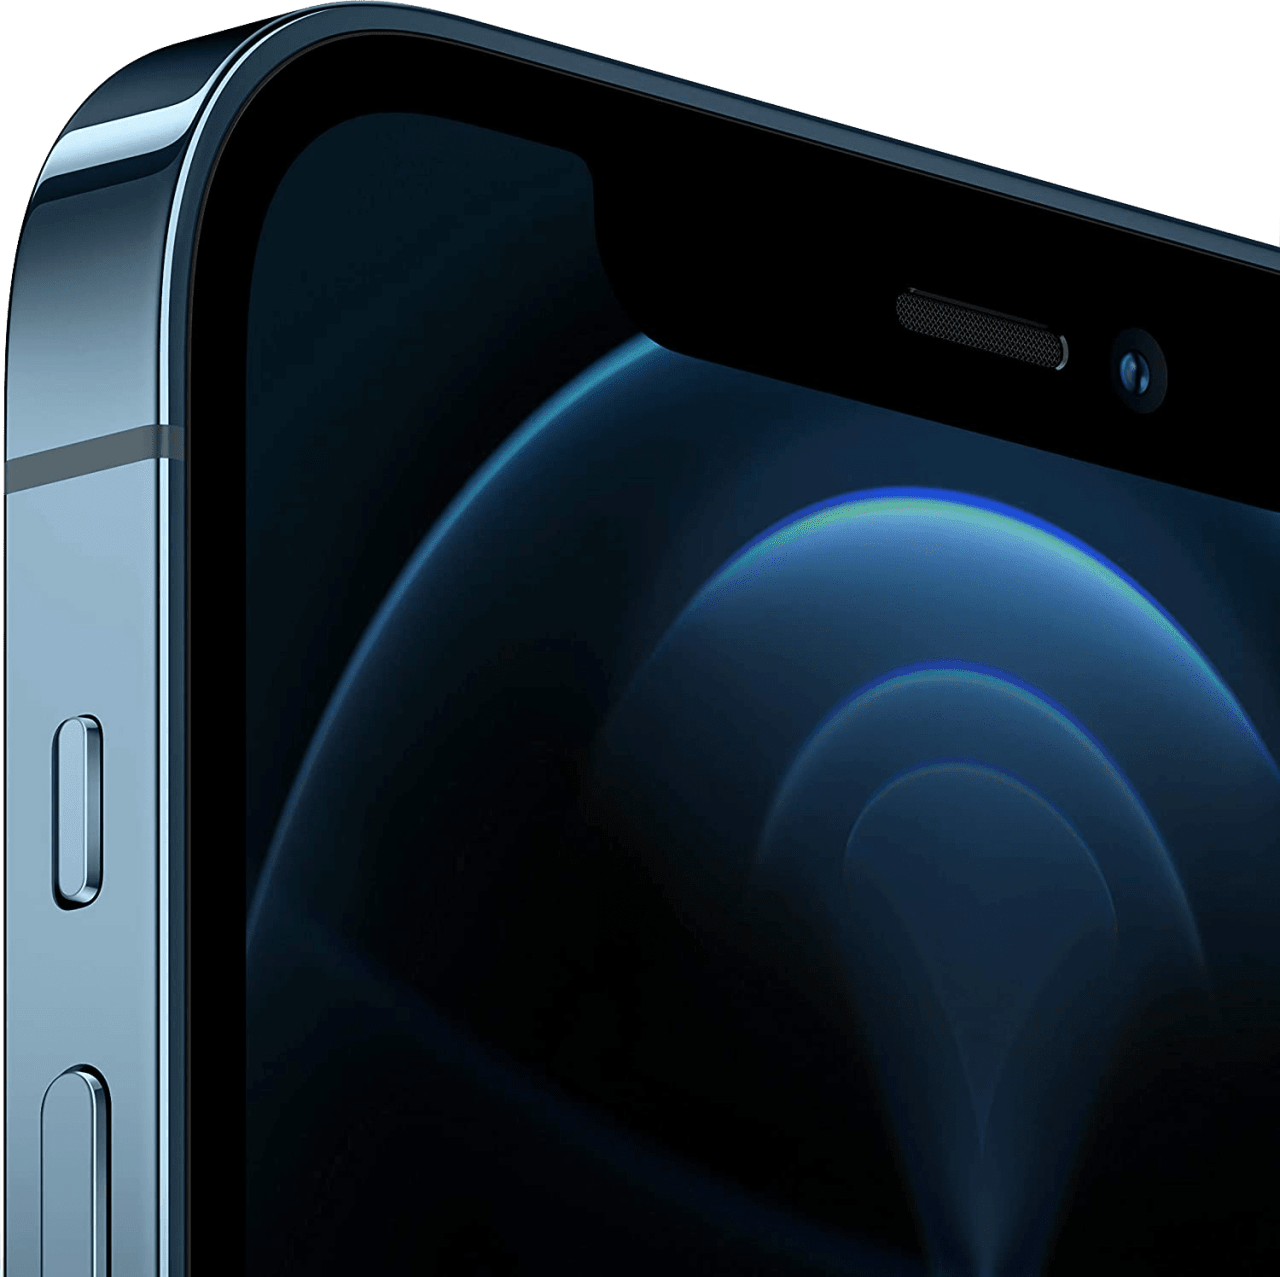 Blau Apple iPhone 12 Pro Max 512GB.4